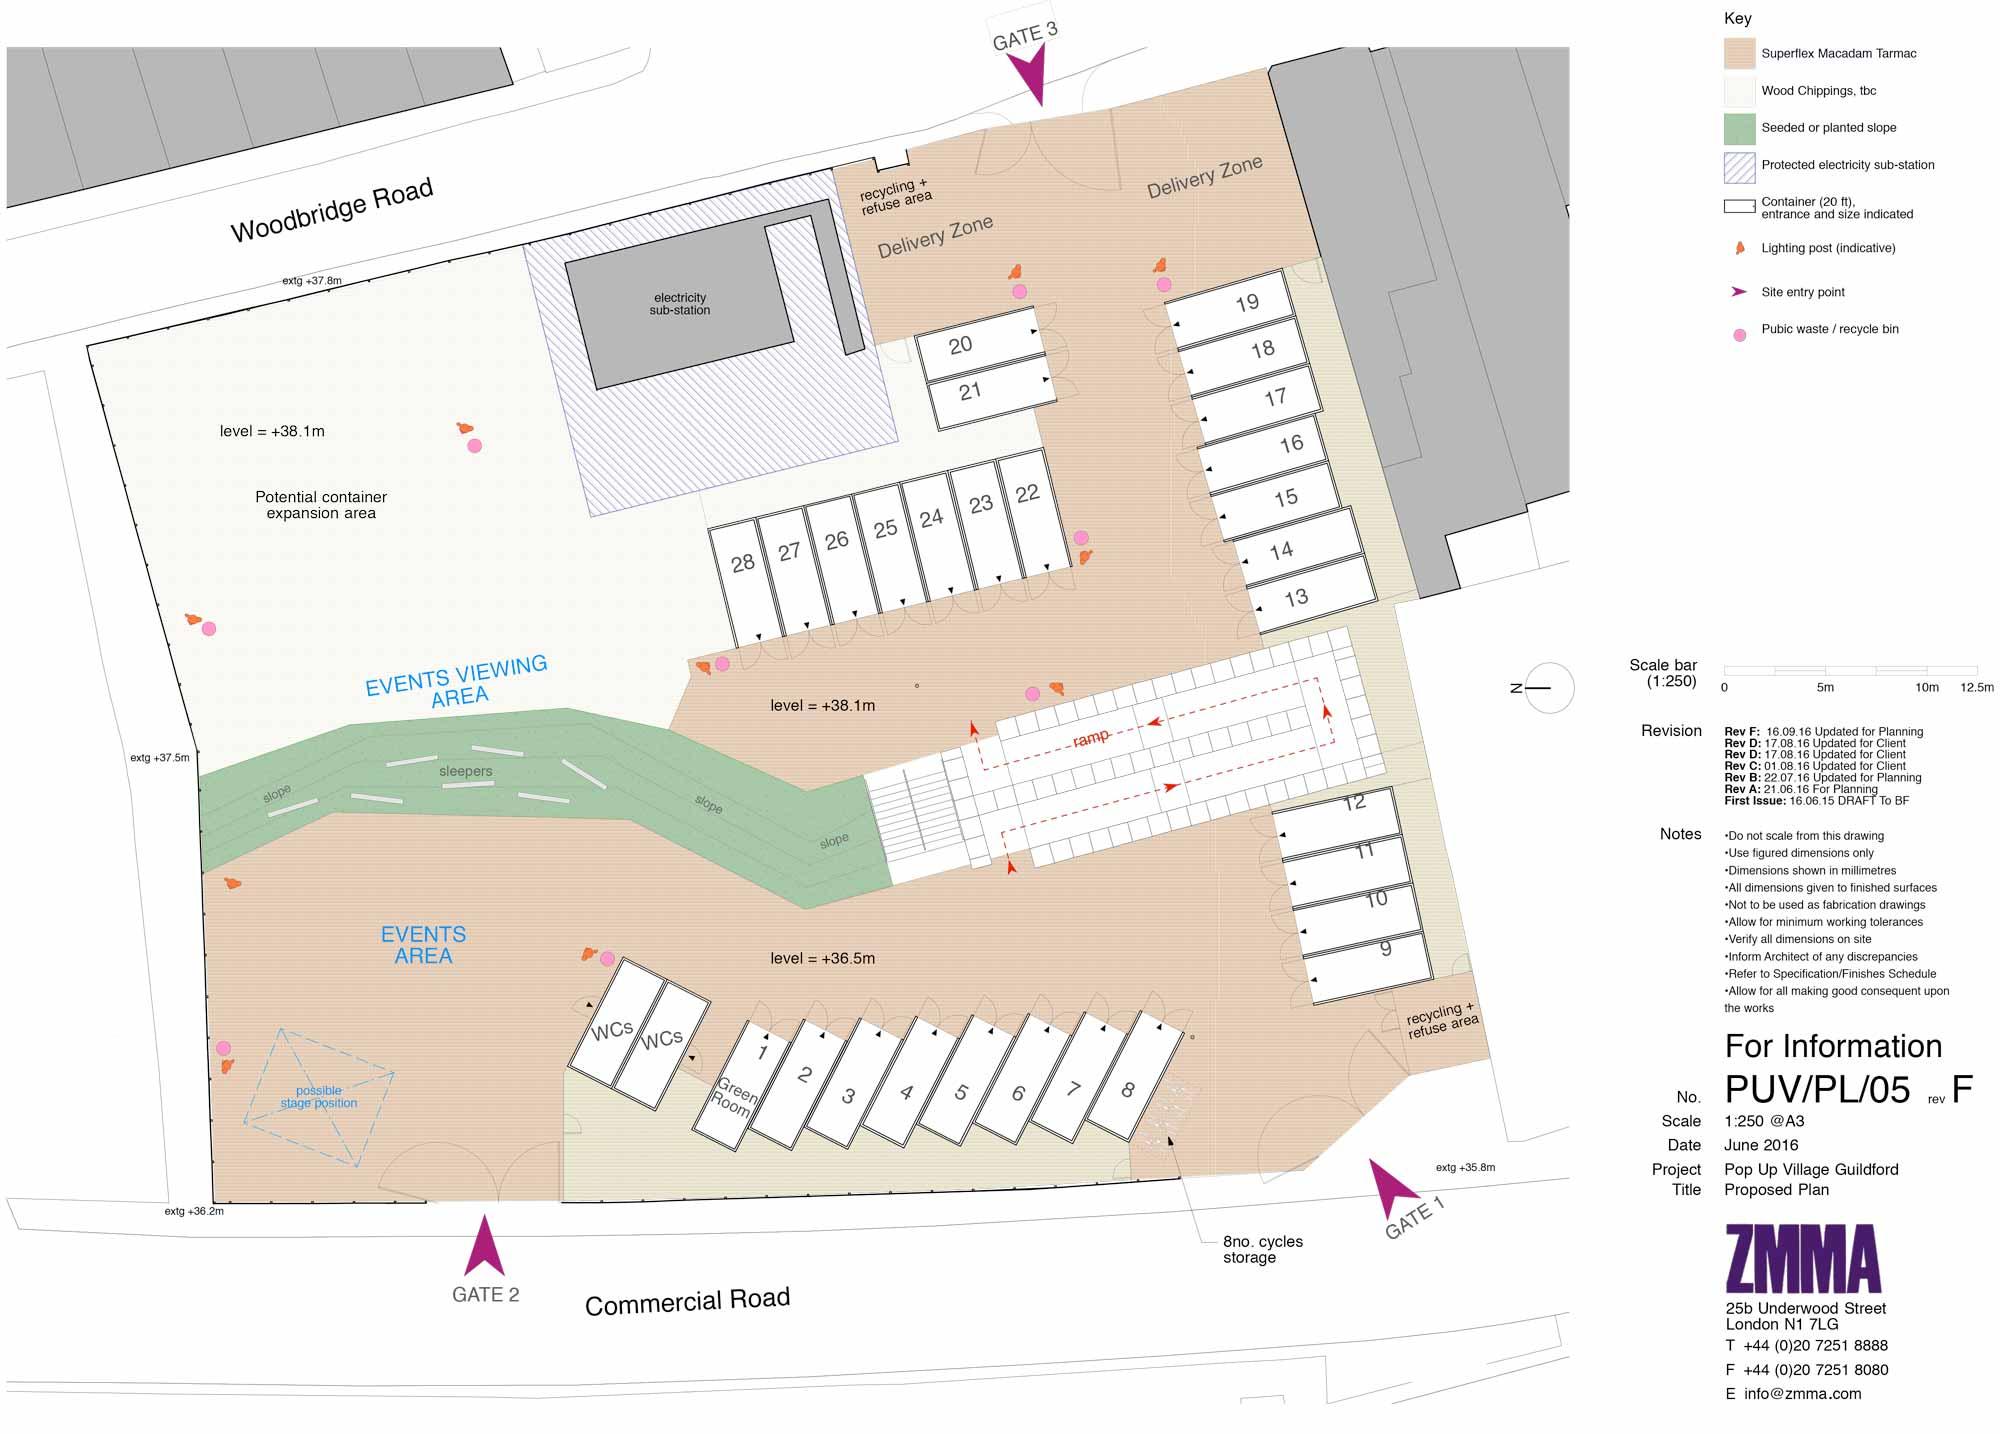 Plan of Guilford Pop Up Village